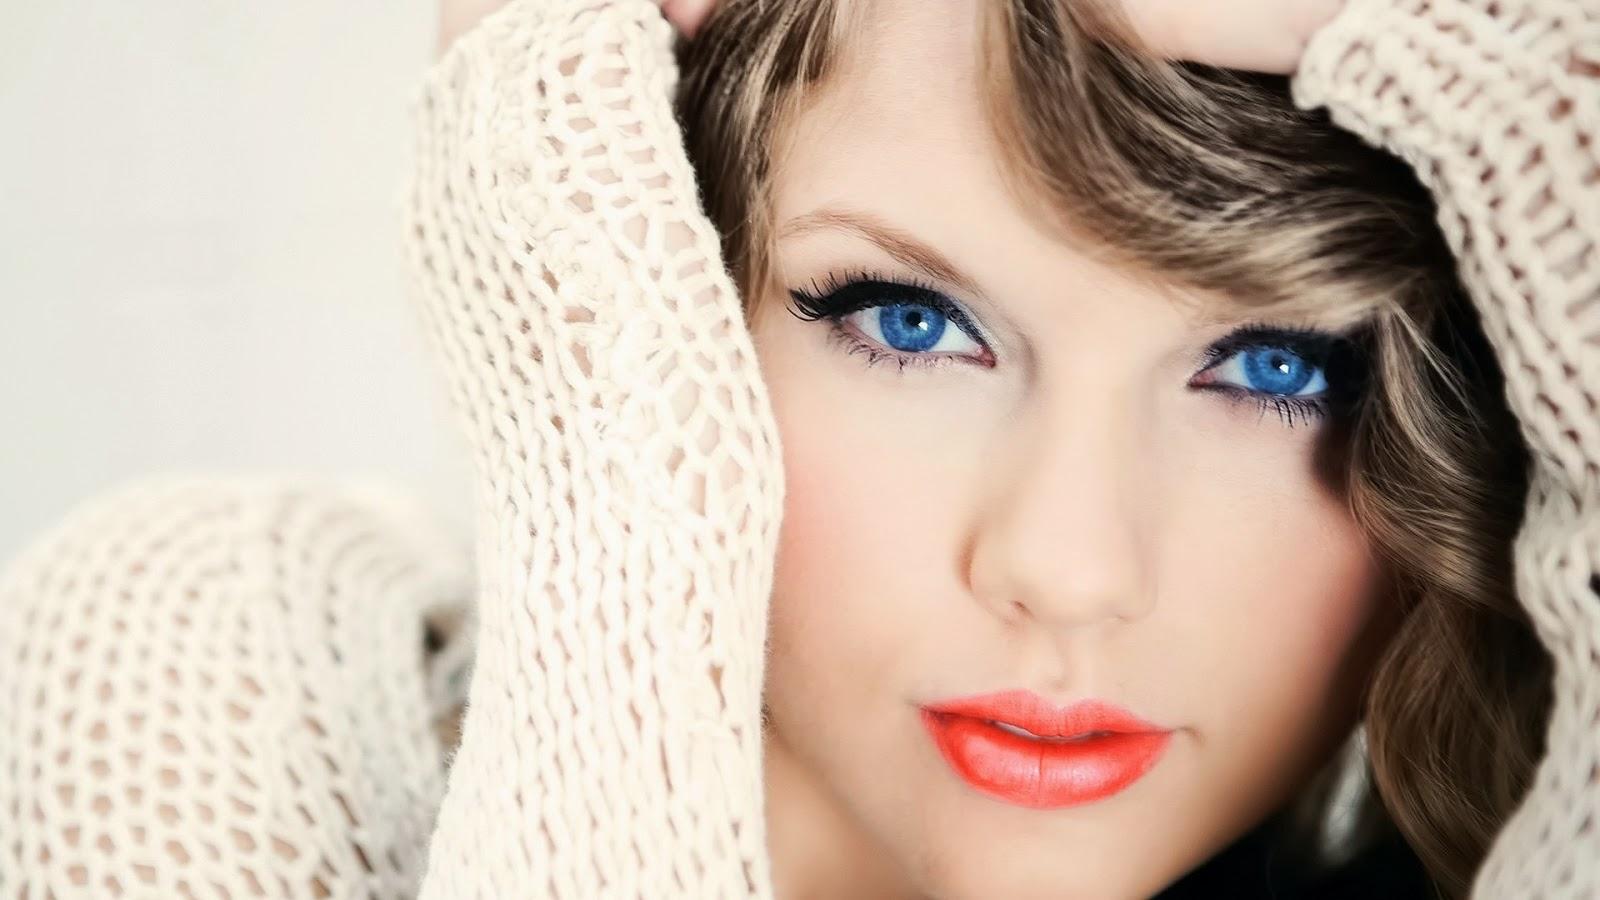 Wallpaper Taylor Swift HD 1080p